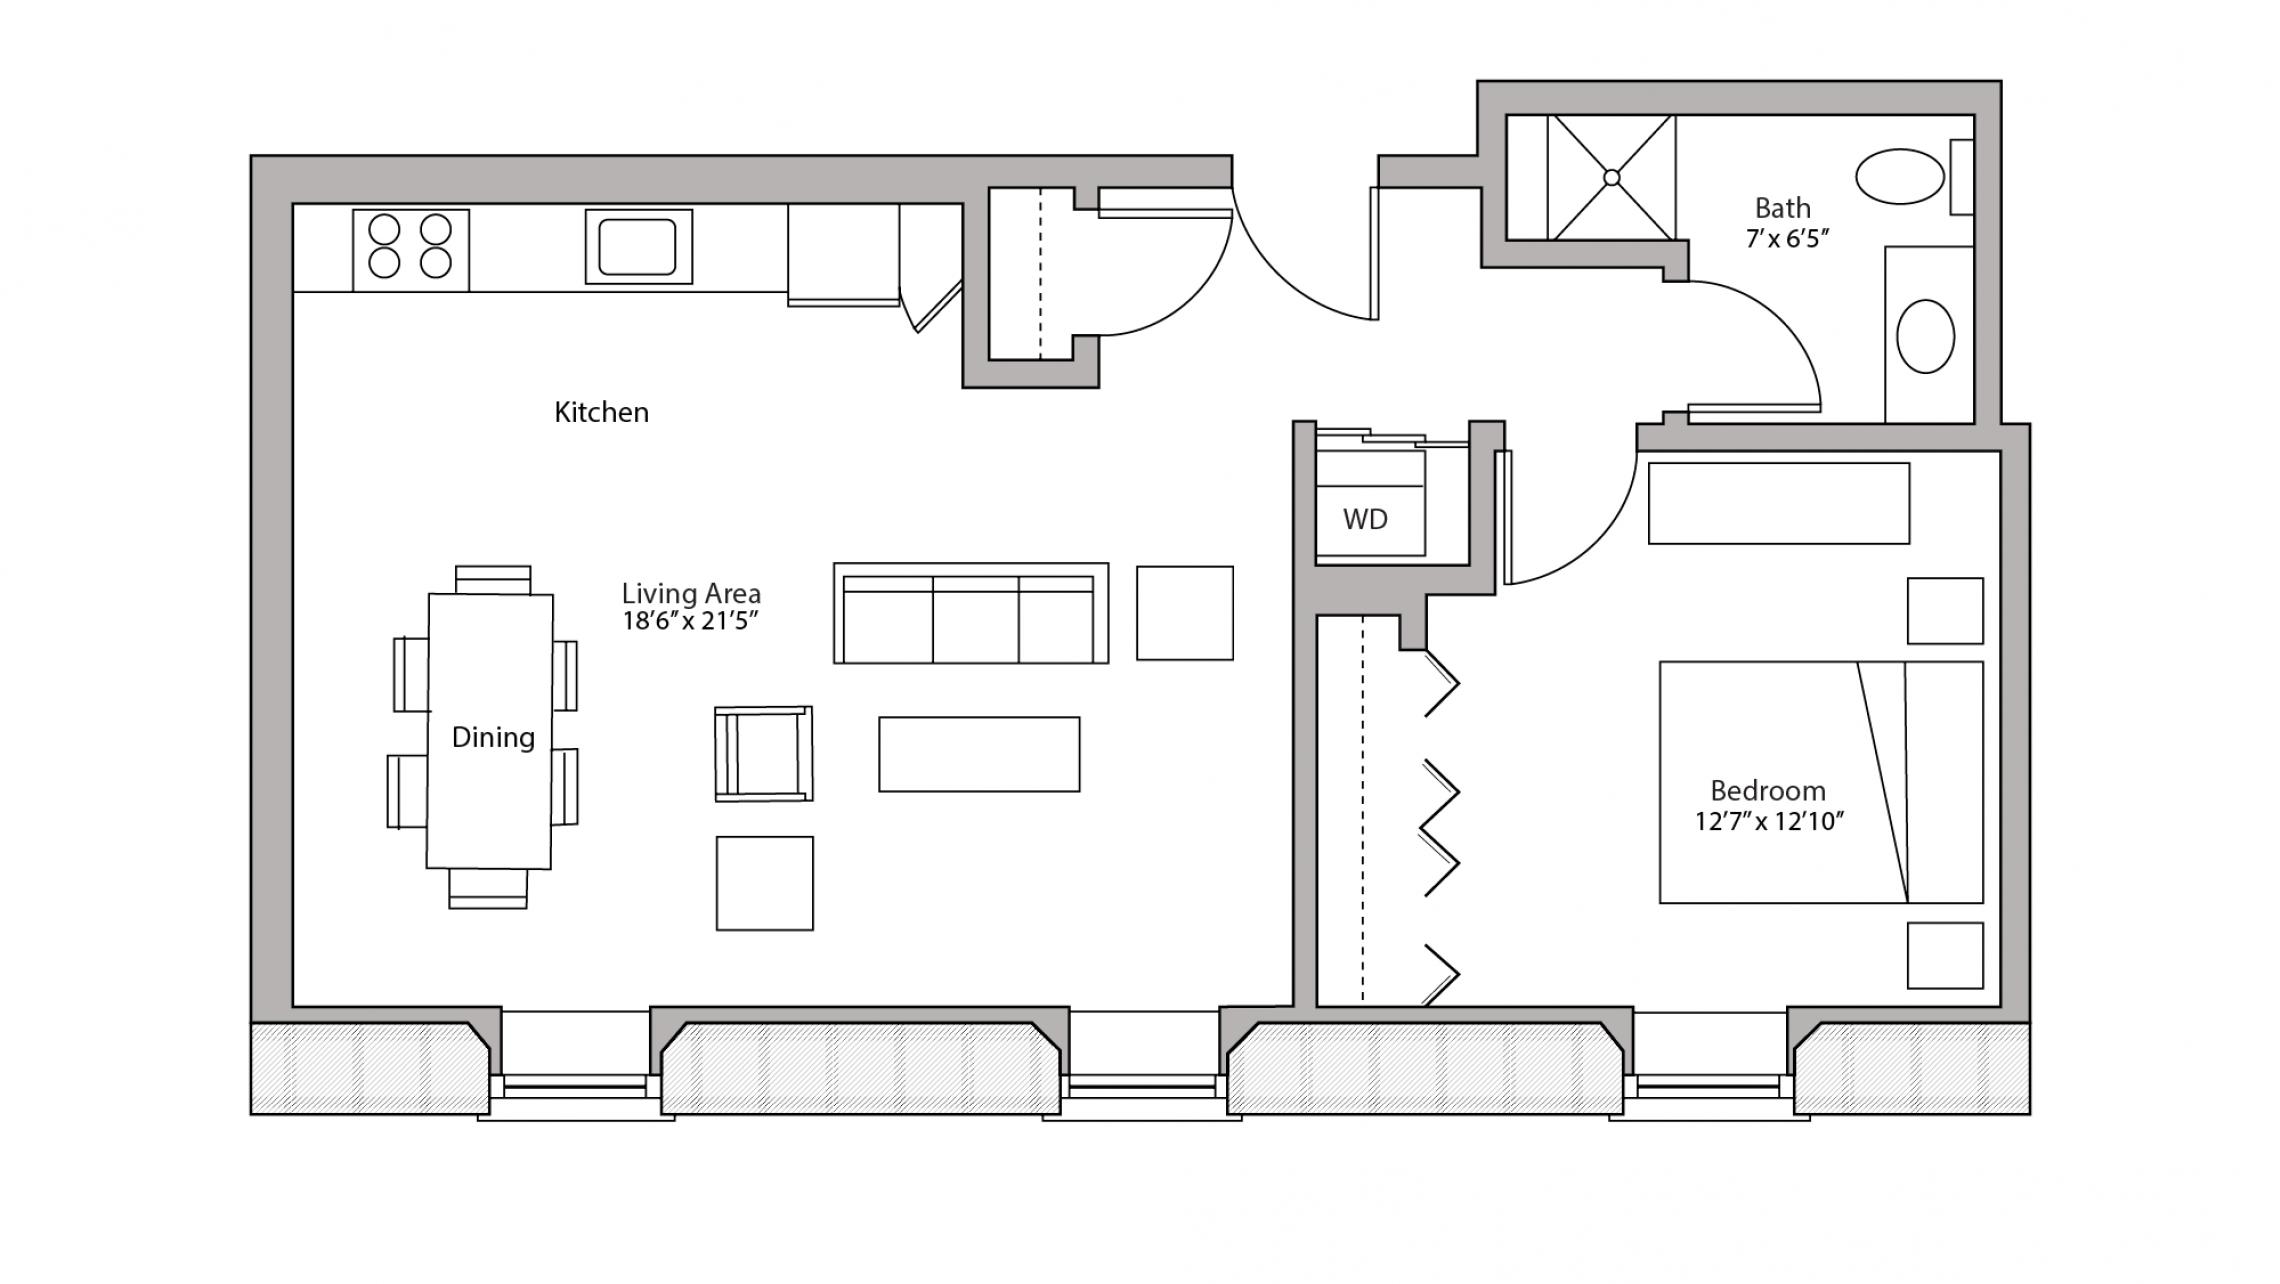 ULI Tobacco Lofts E310 - One Bedroom, One Bathroom